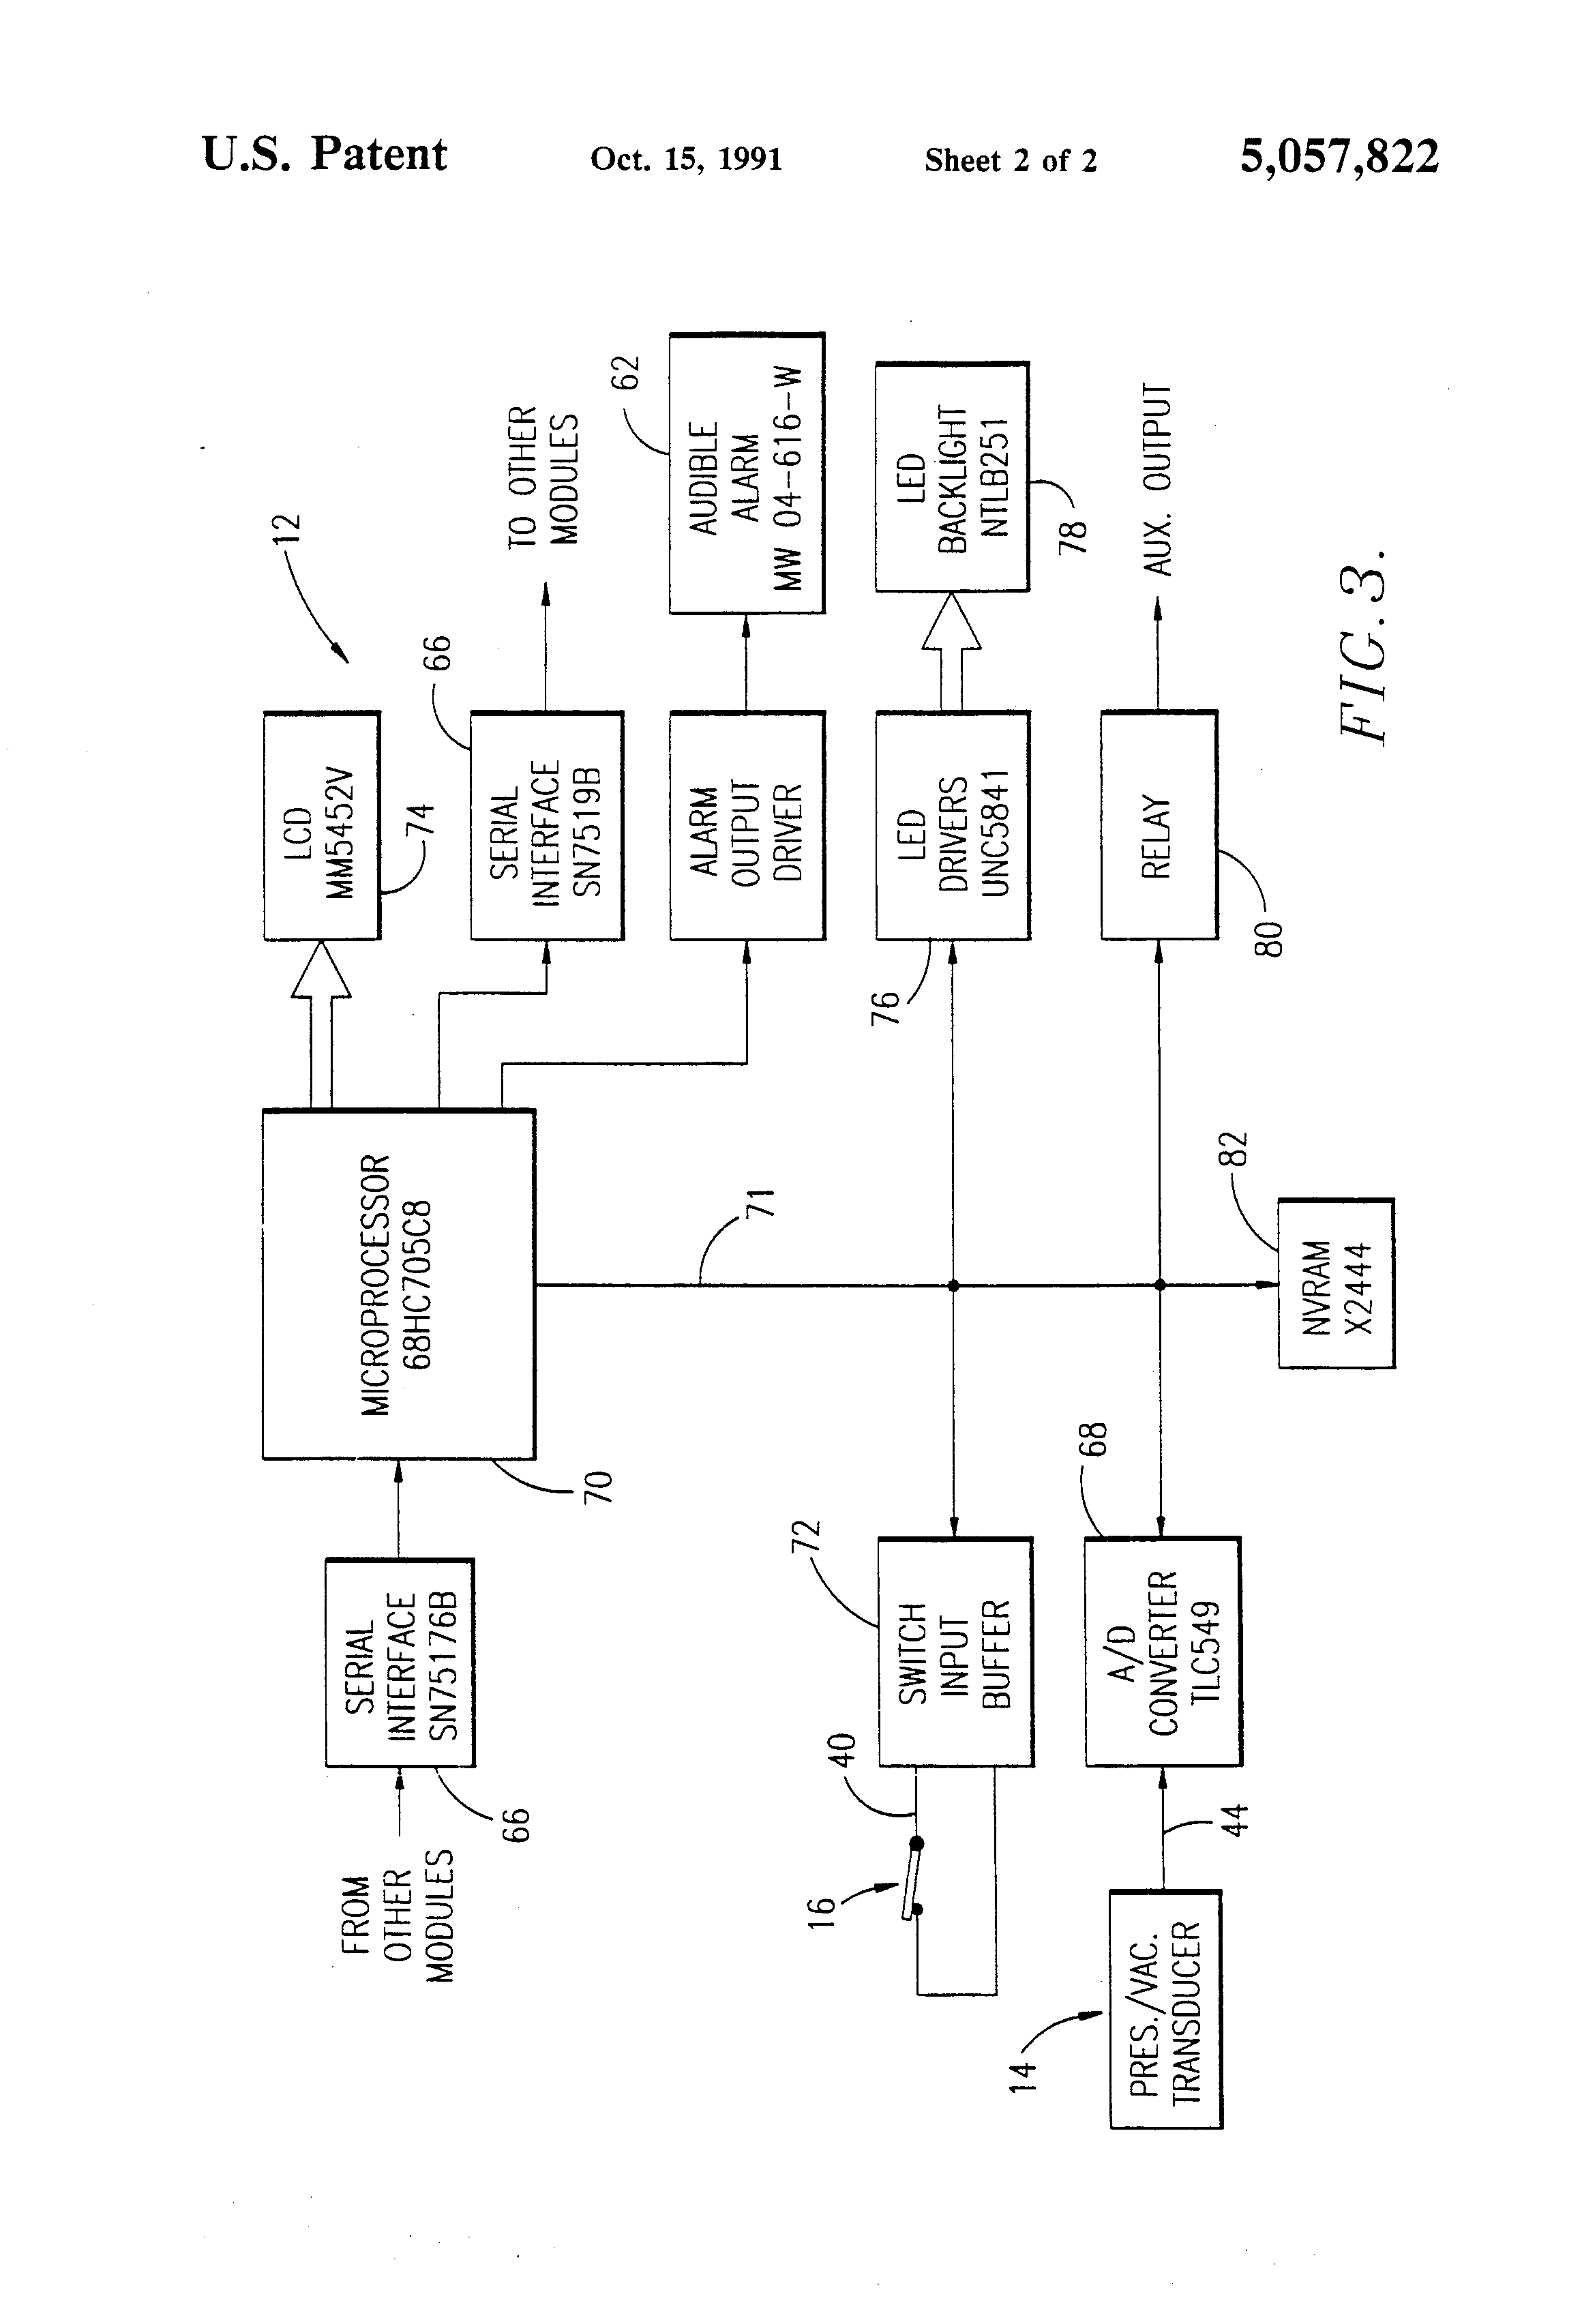 3 phase motor wiring diagrams 120 control diagrams patent us5057822 - medical gas alarm system - google patents chemetron wiring diagrams #1